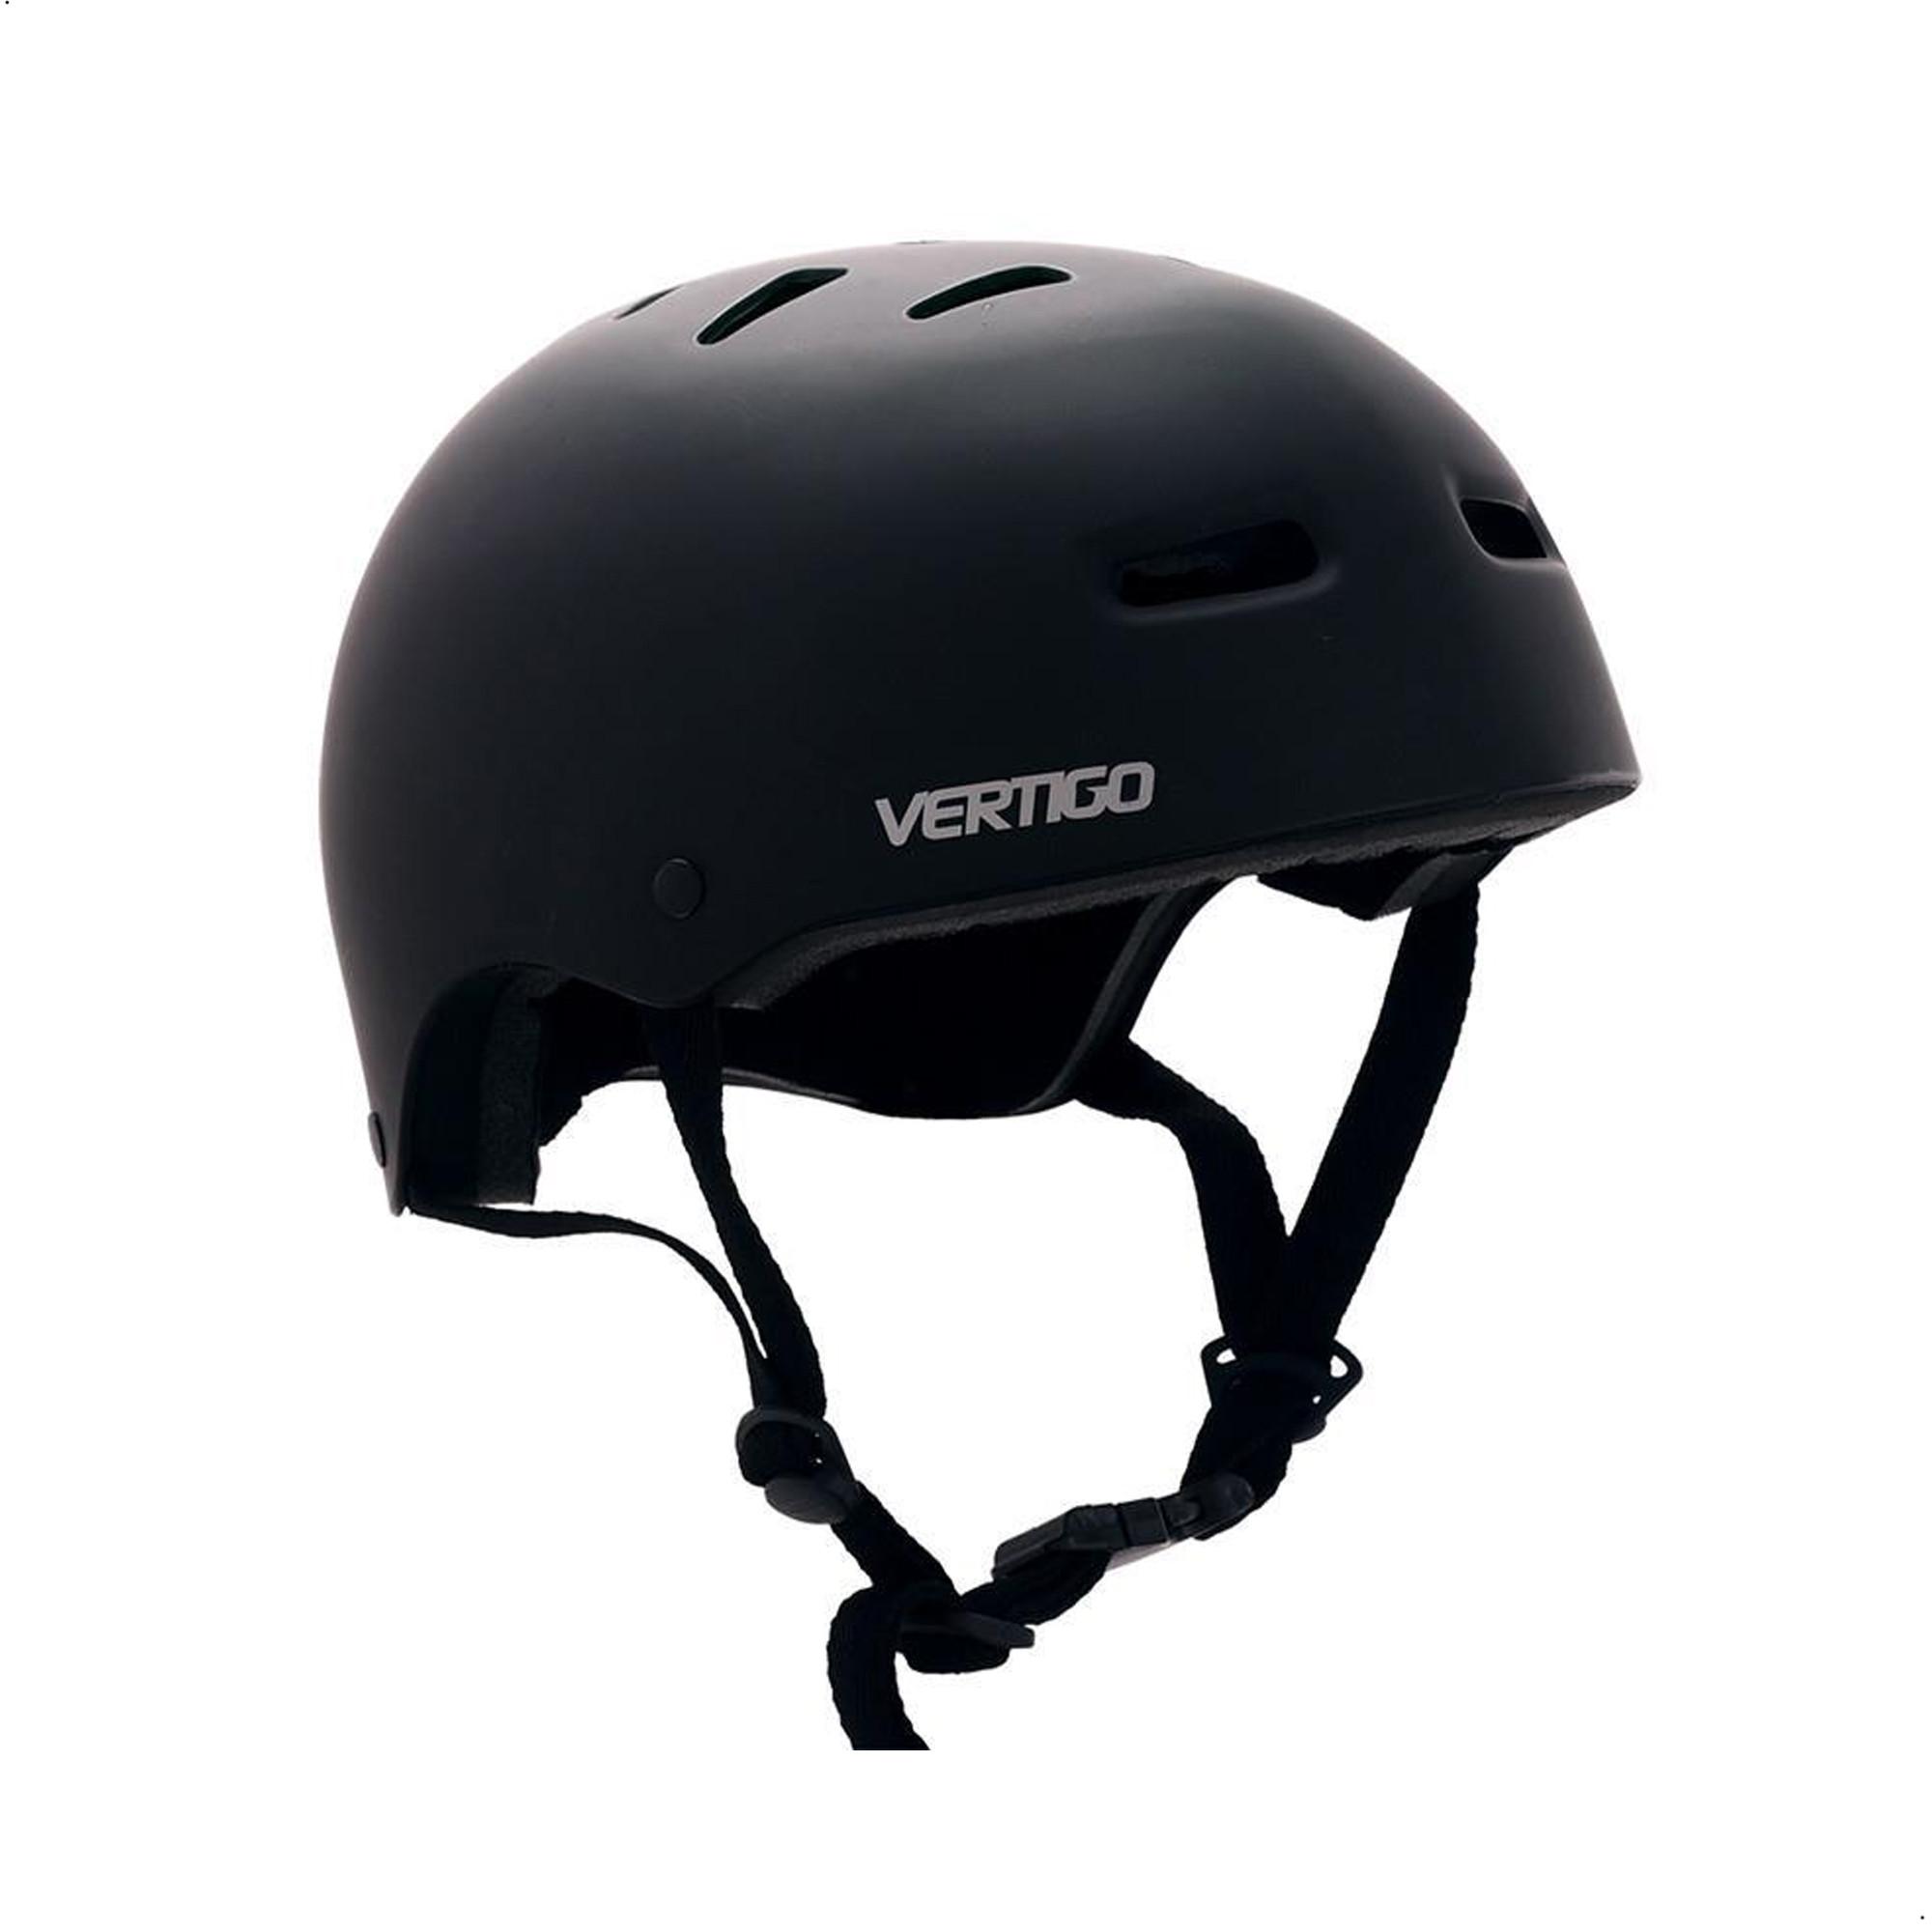 Casco Proteccion Bicicleta Vertigo Negro Mate